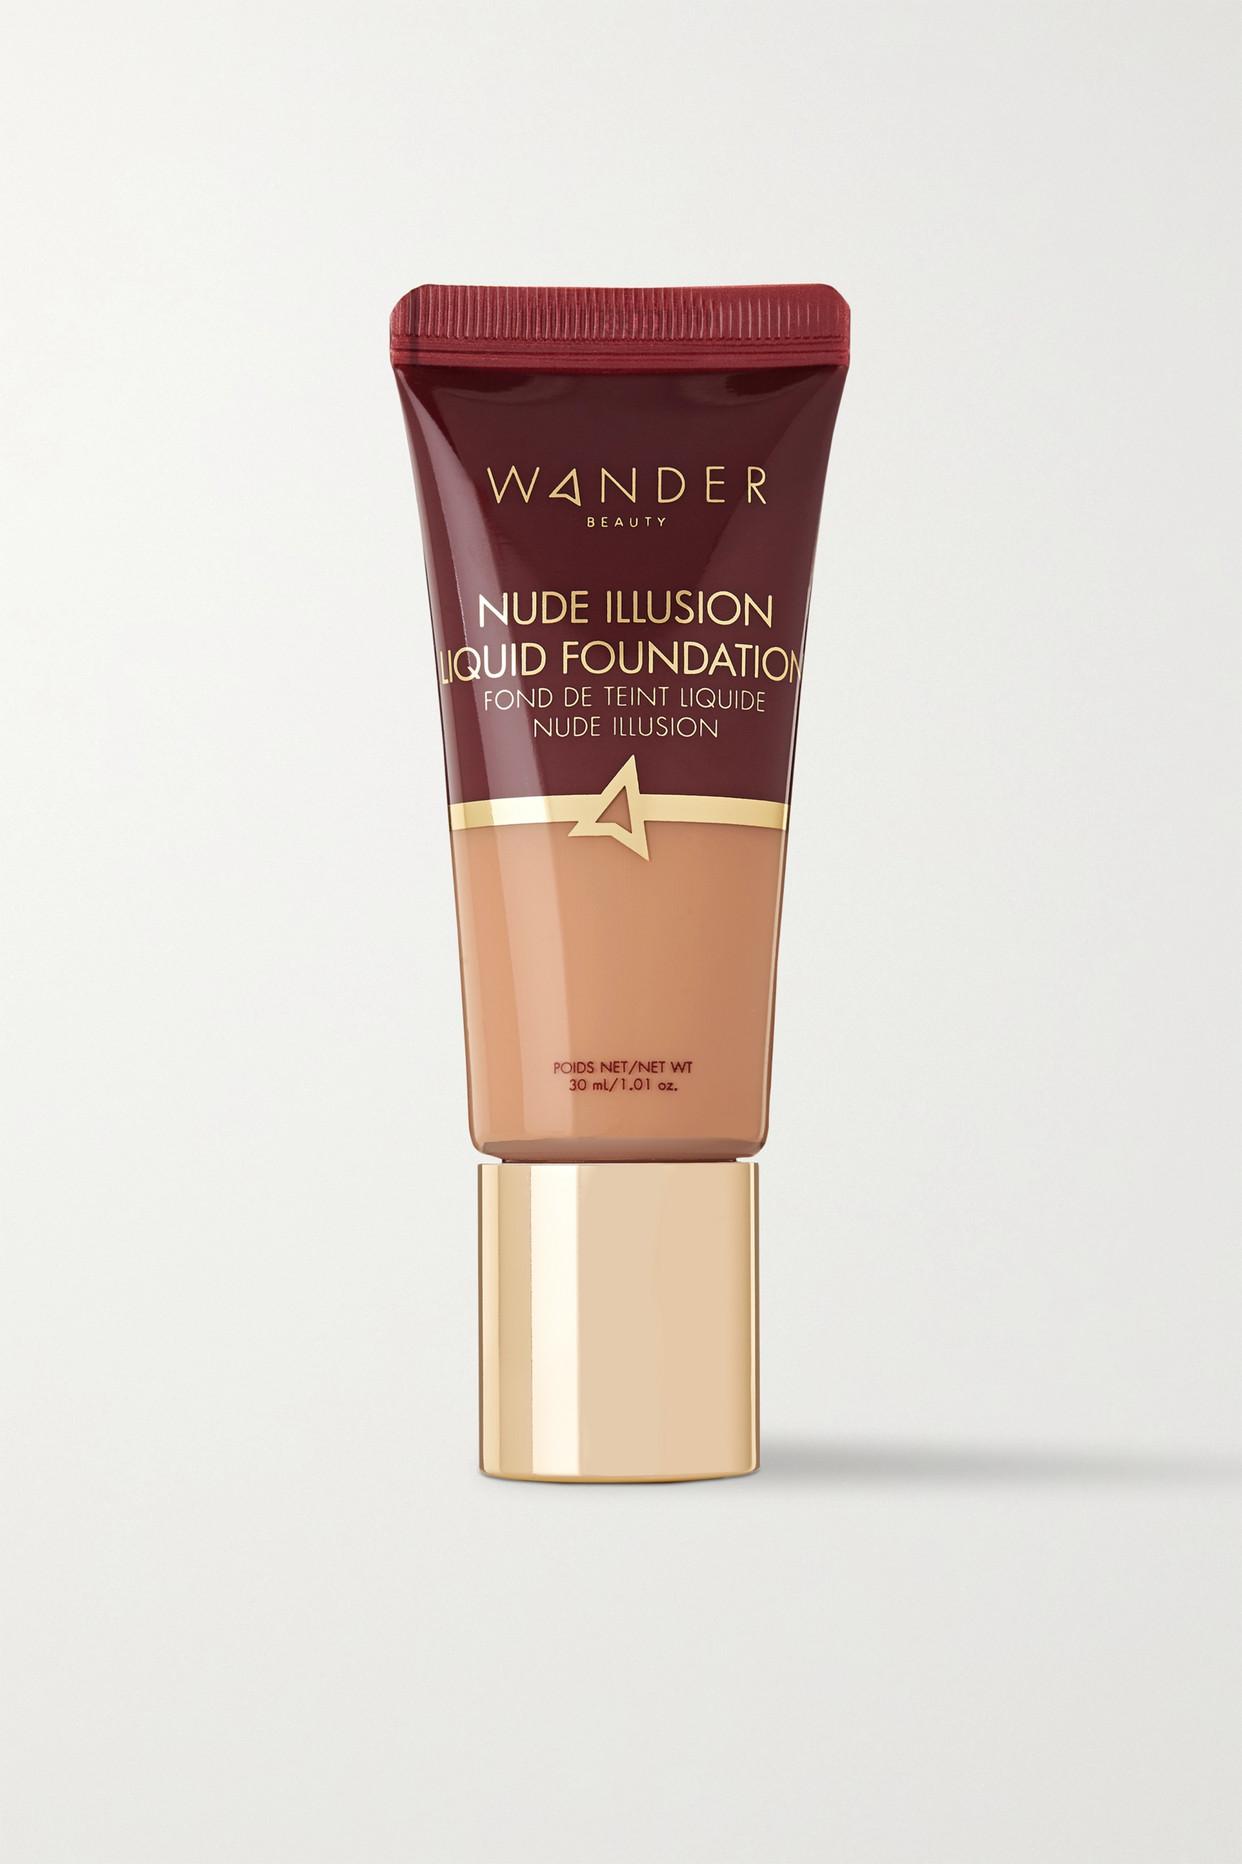 WANDER BEAUTY - Nude Illusion Liquid Foundation - Light Medium - Neutrals - one size